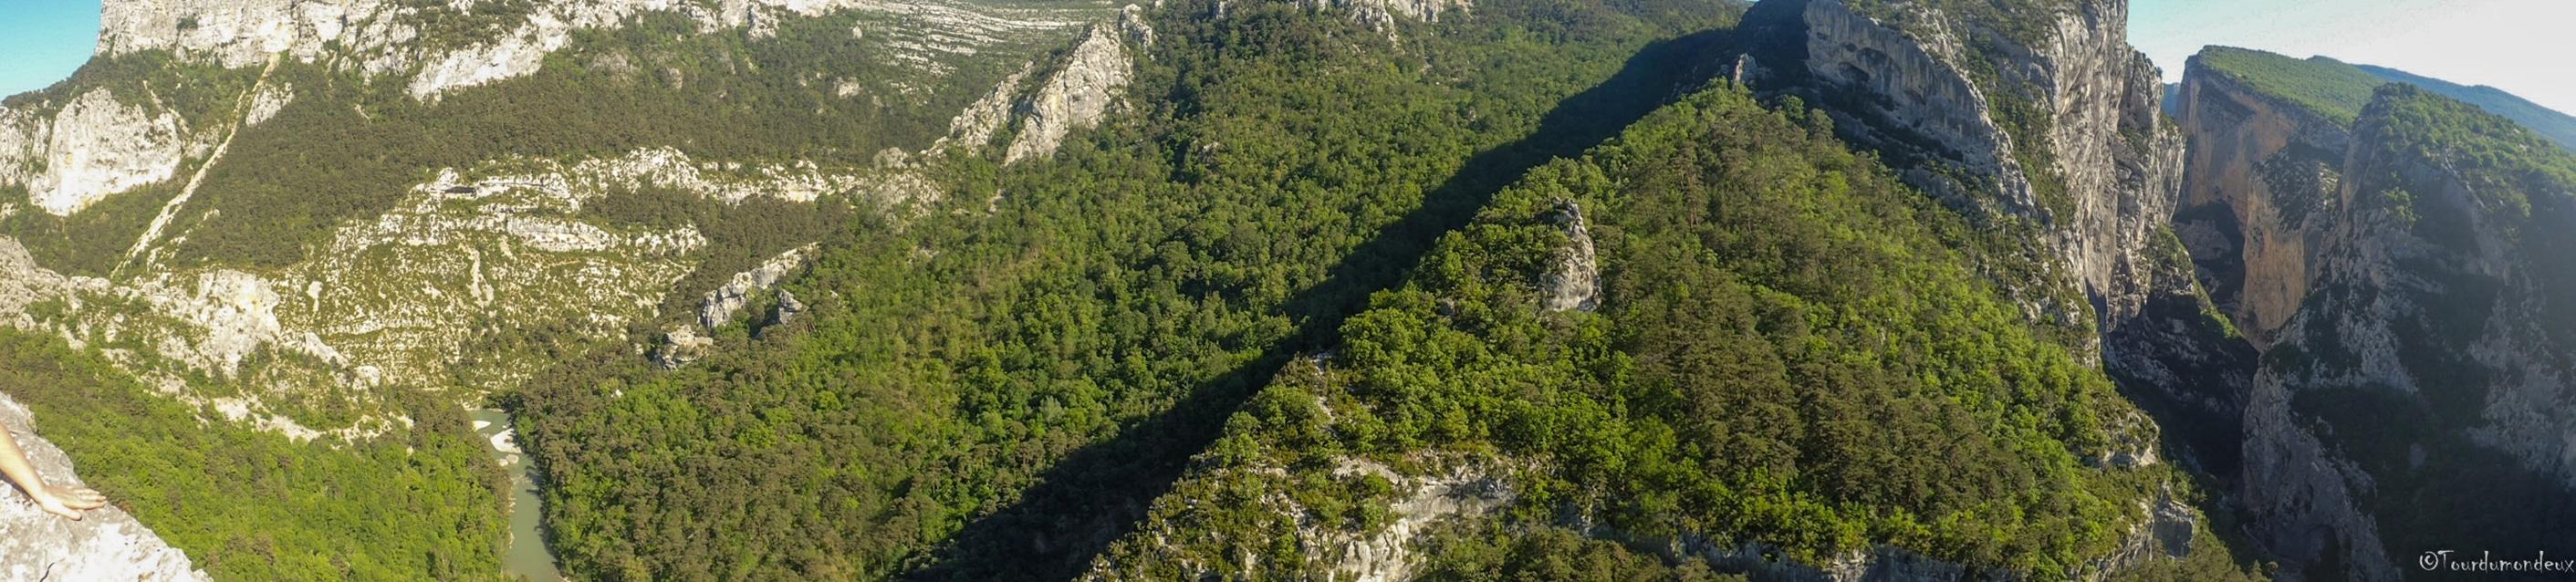 gorges-verdon-panorama-point-sublime